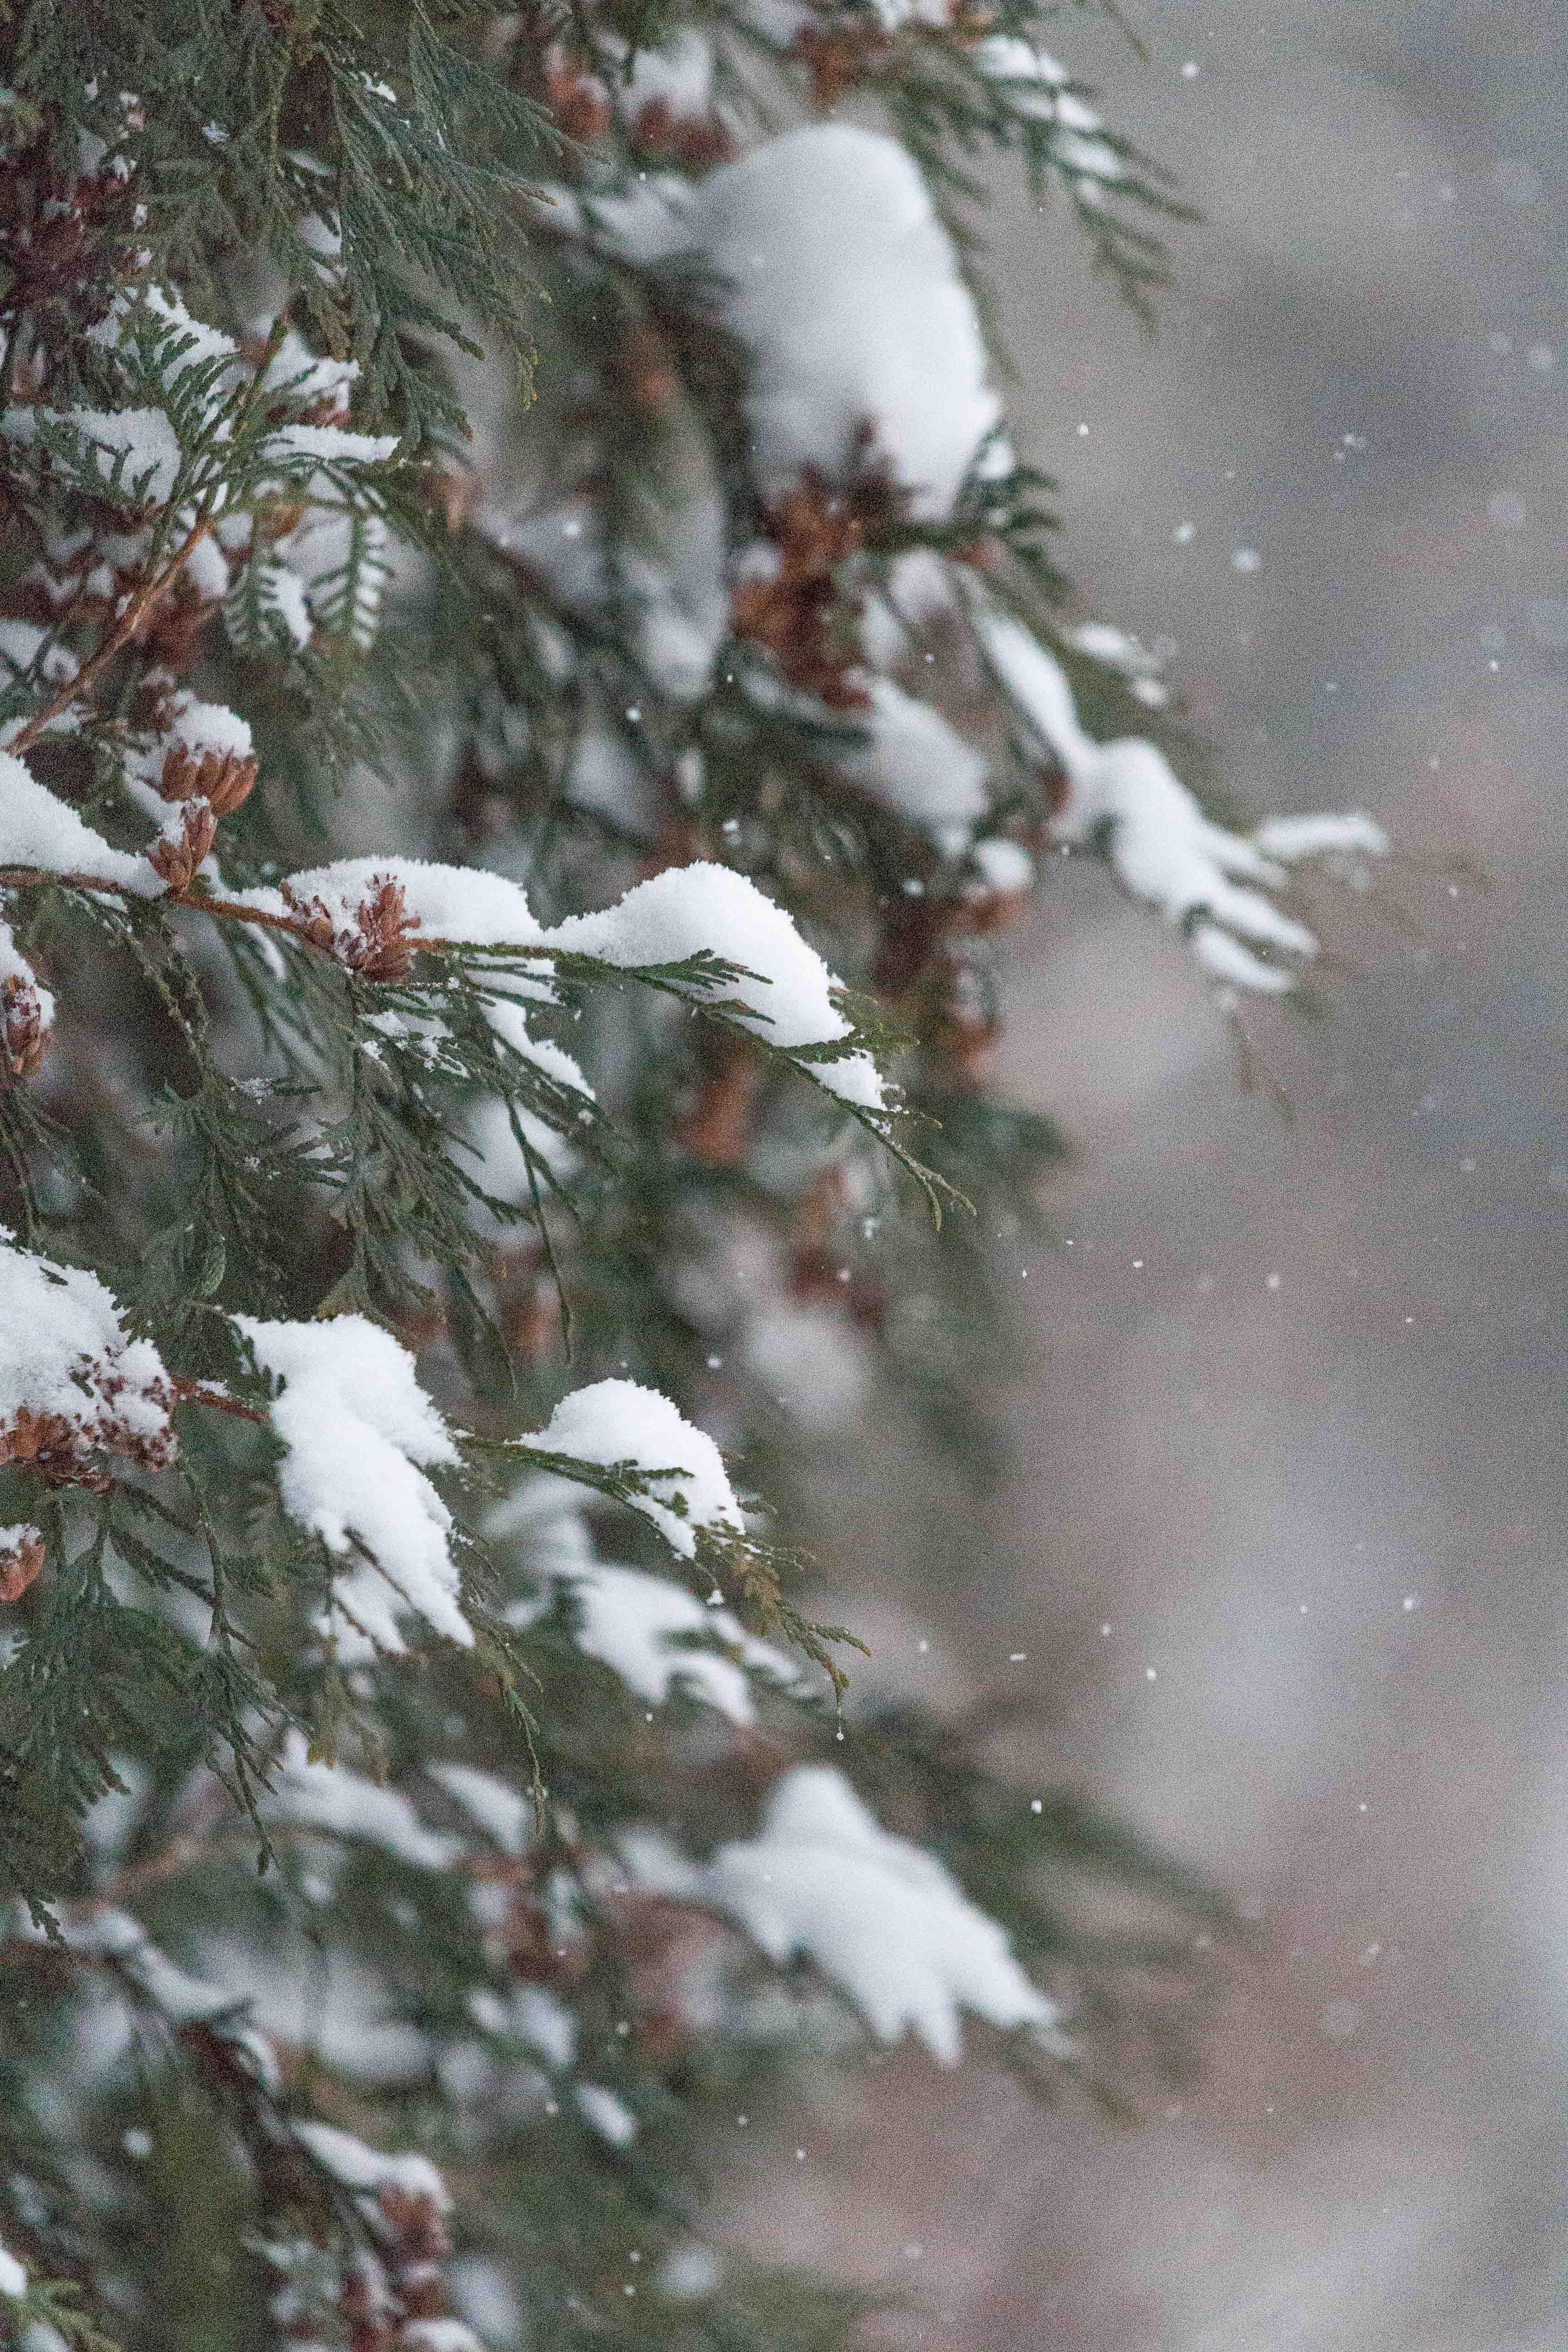 Snow in the Backyard | https://www.roseclearfield.com